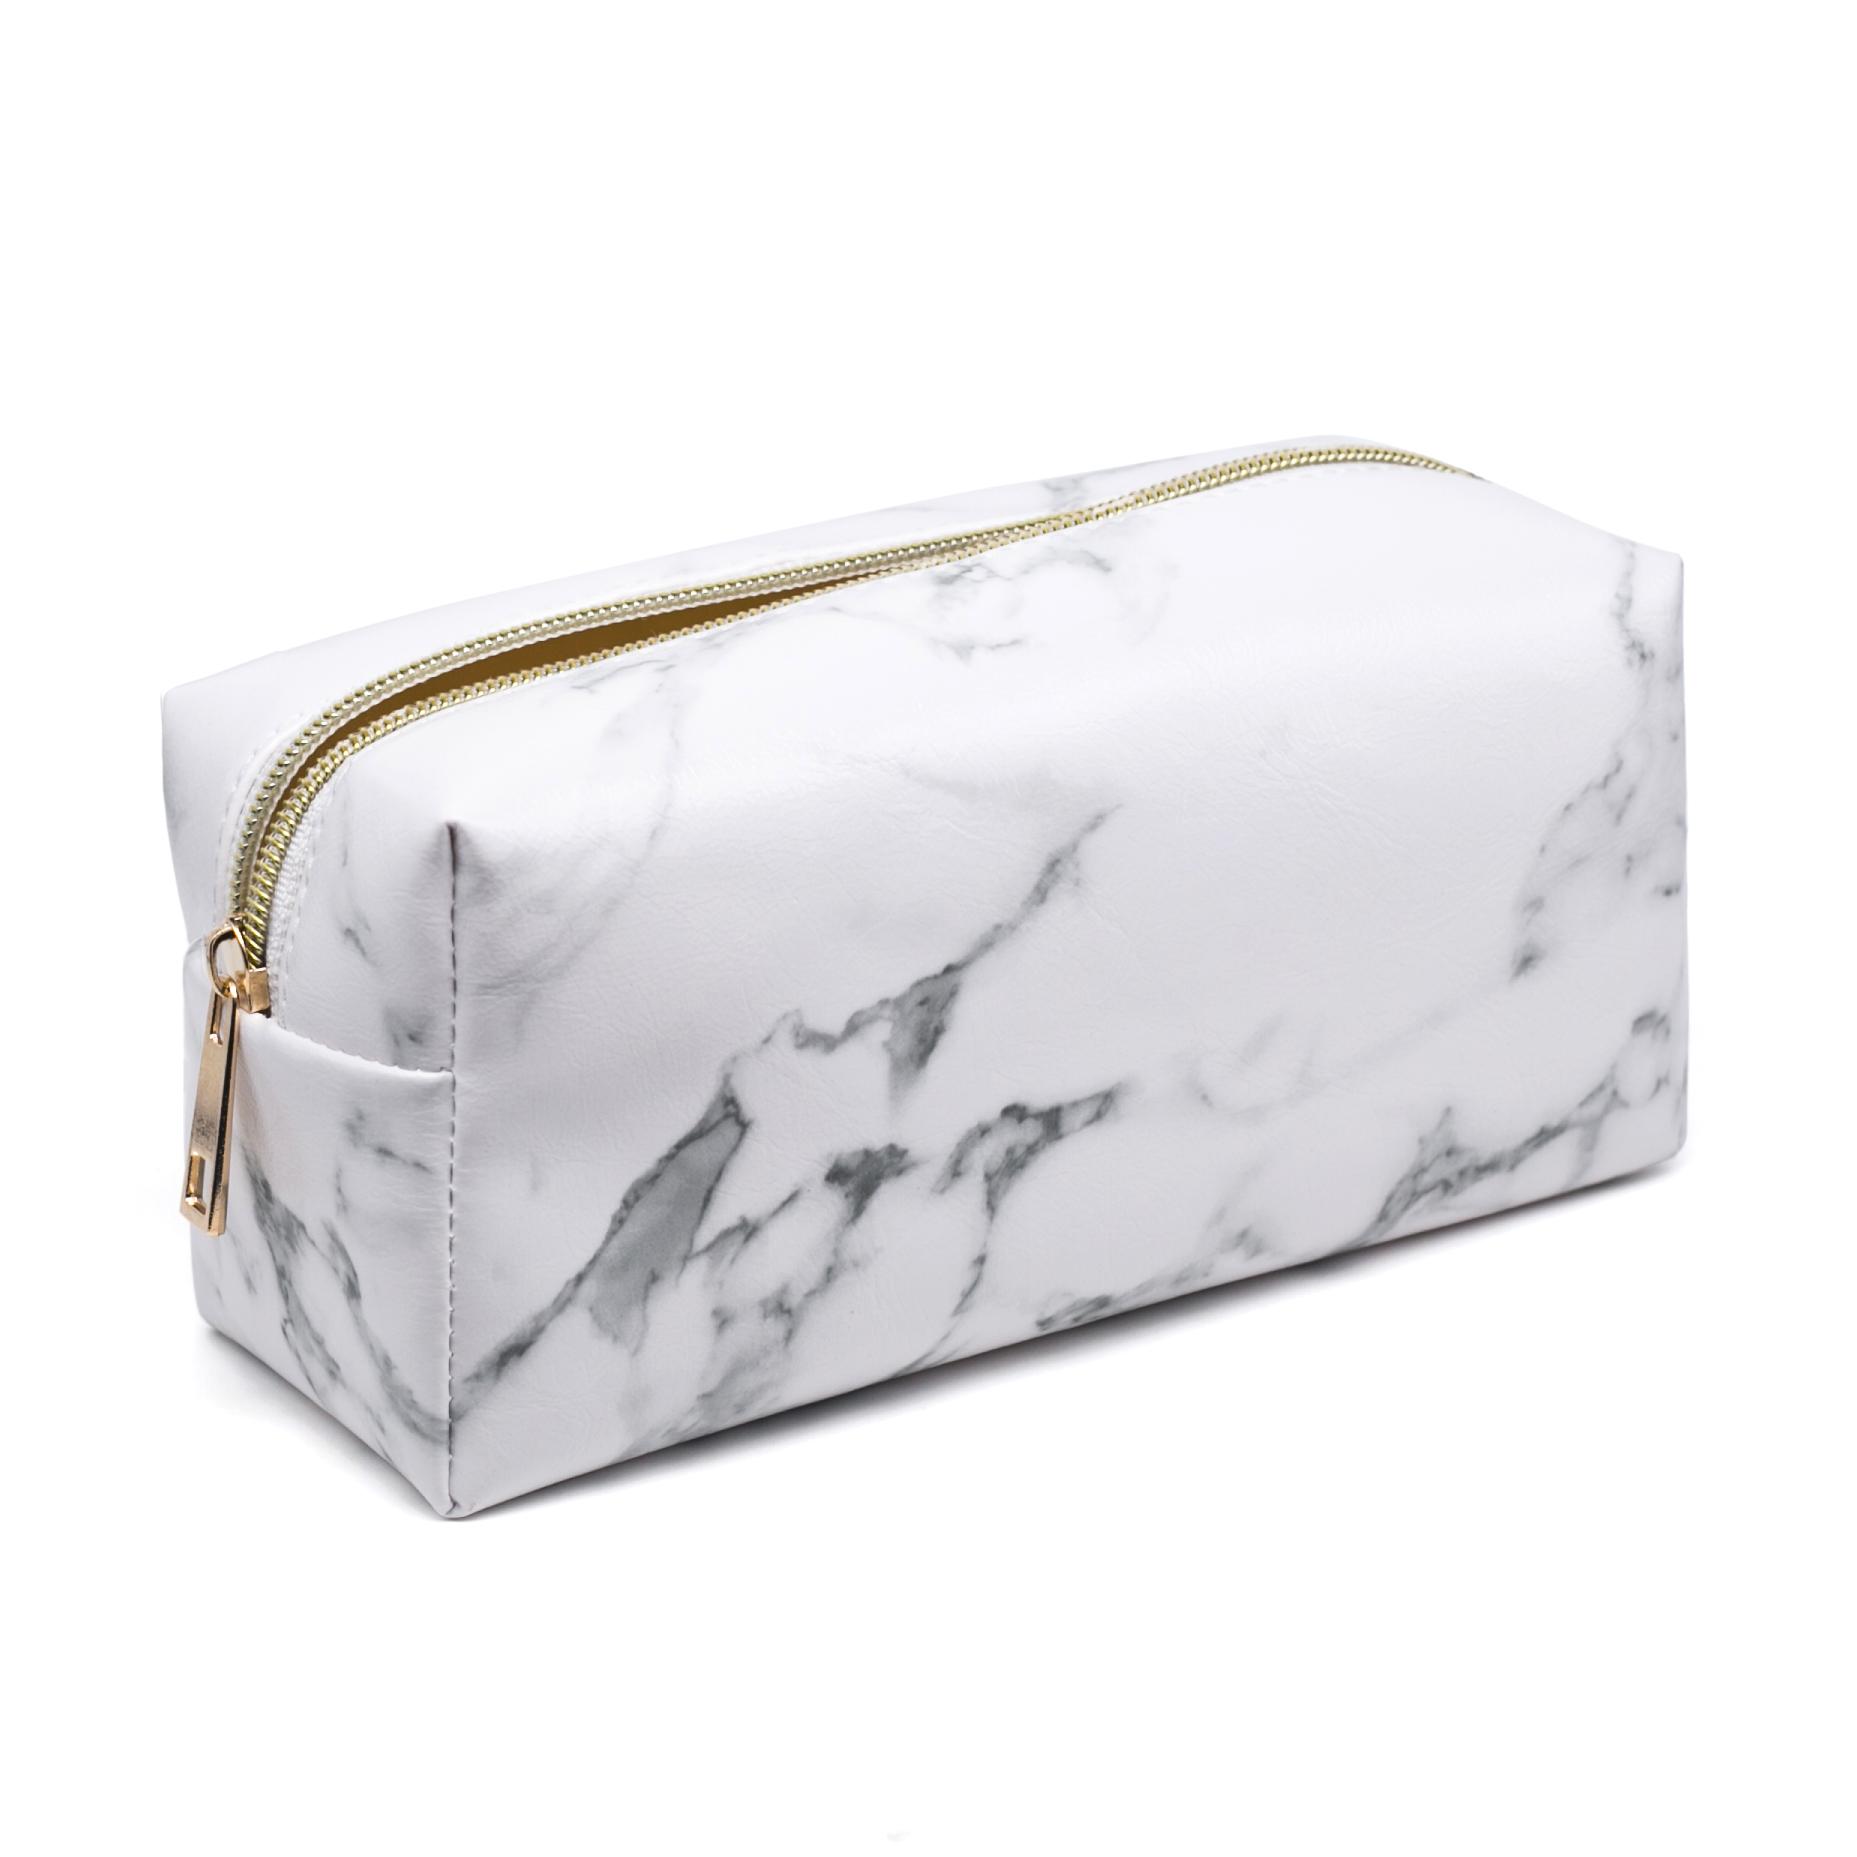 2019 New Marbling PU Makeup Bag Portable Travel Cosmetic Organizer Case for Makeup Brush